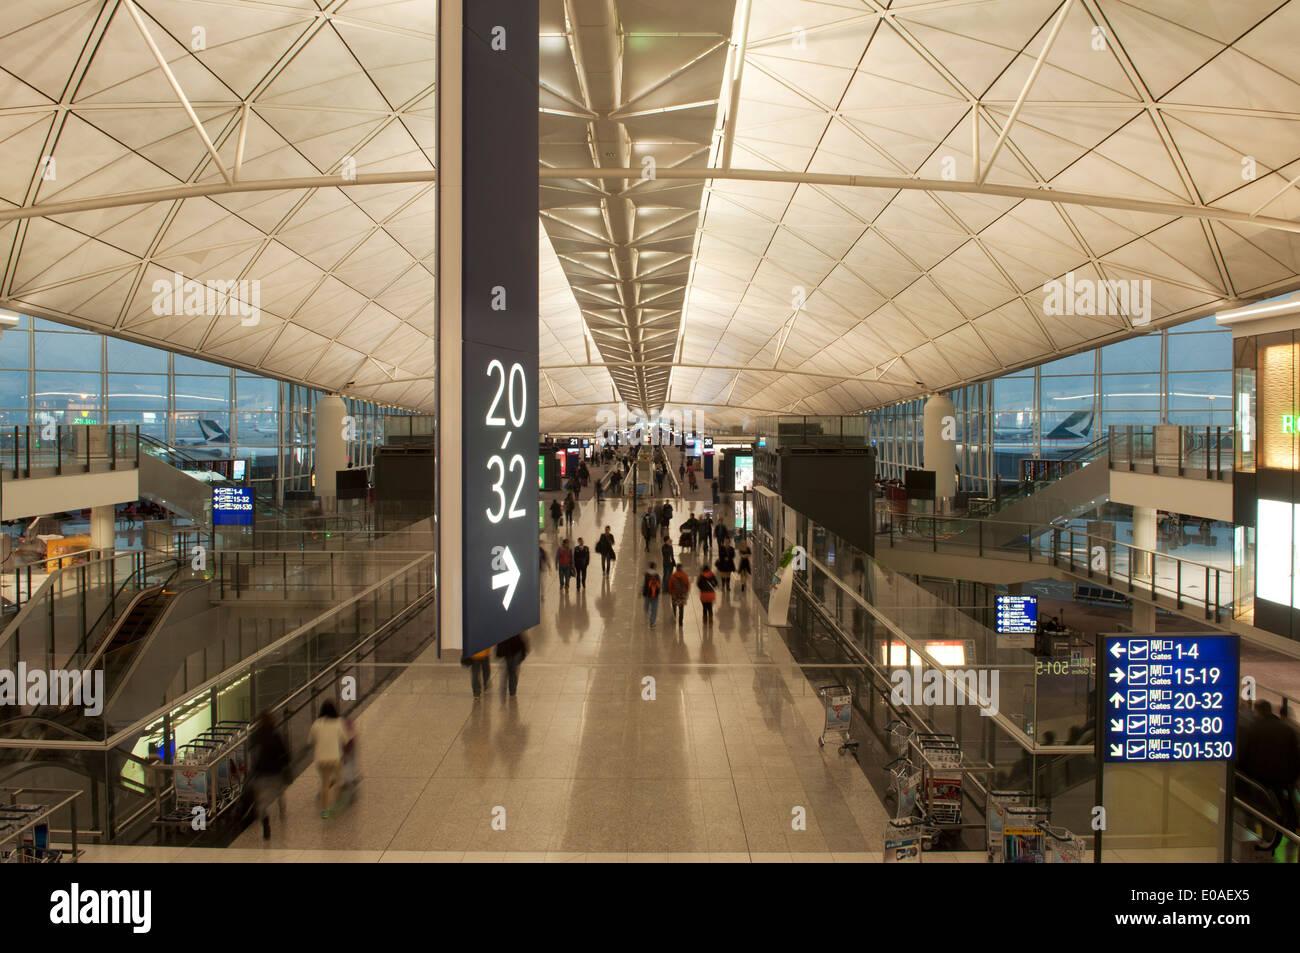 Ceilings and numbers, Hong Kong International Airport, Island of Chek Lap Kok, China - Stock Image